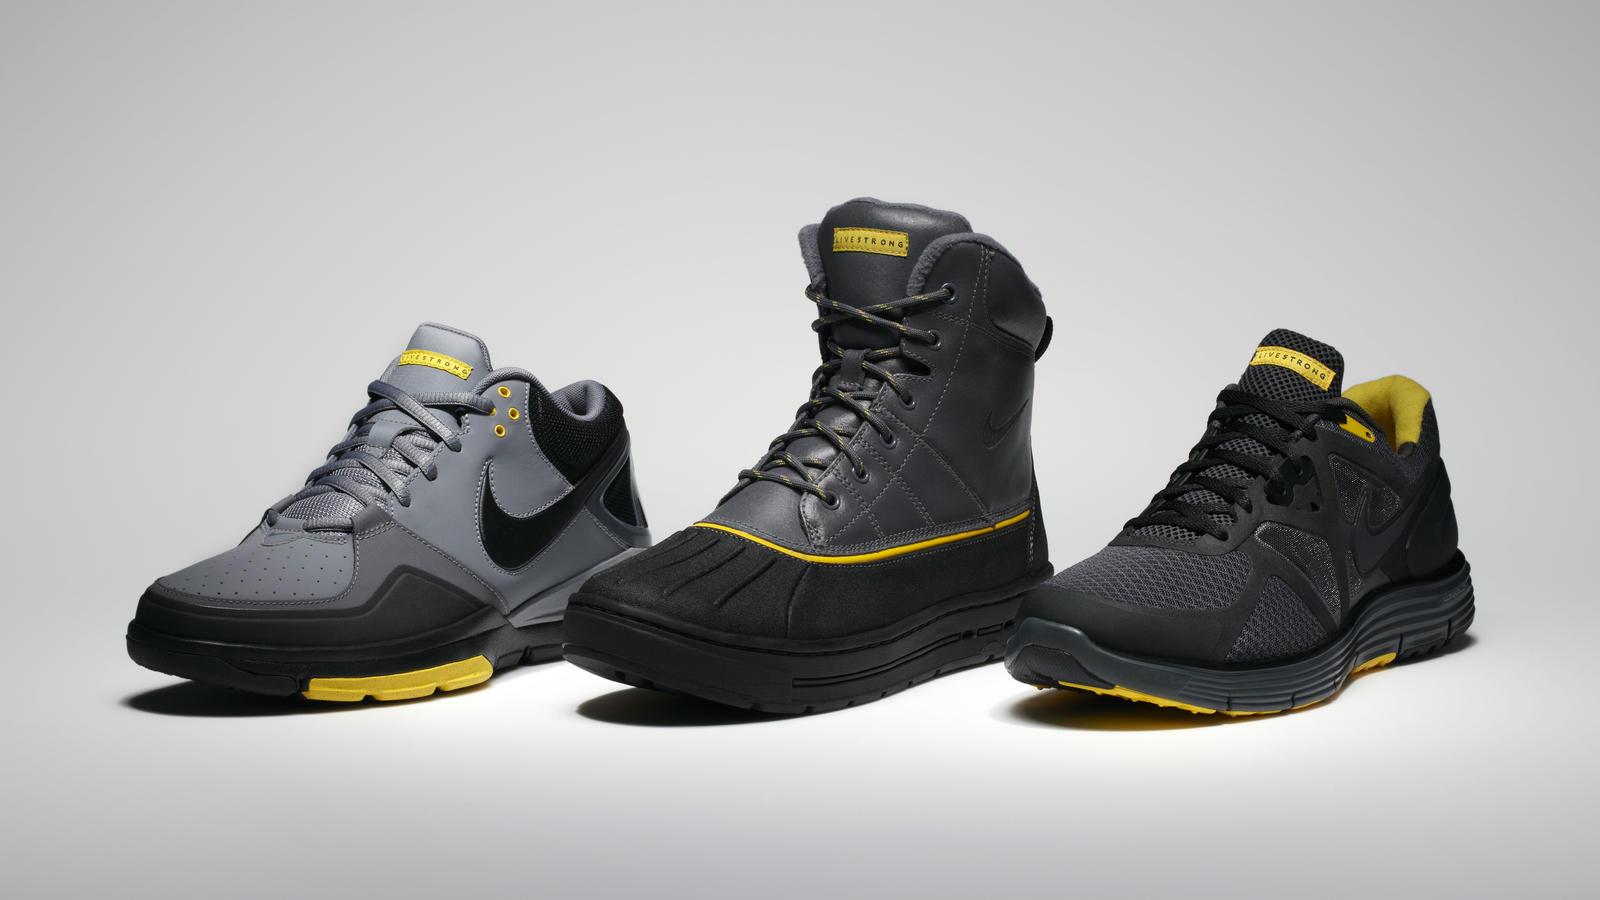 Men's LIVESTRONG shoes